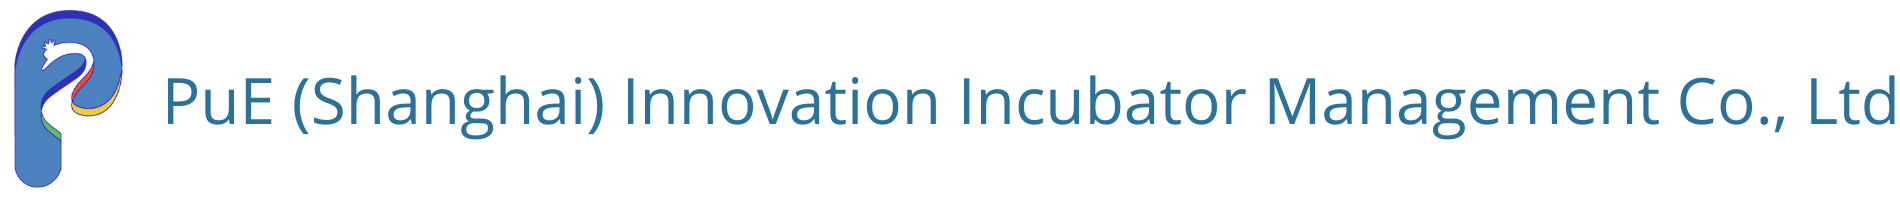 PuE (Shanghai) Innovation Incubator Management Co., Ltd